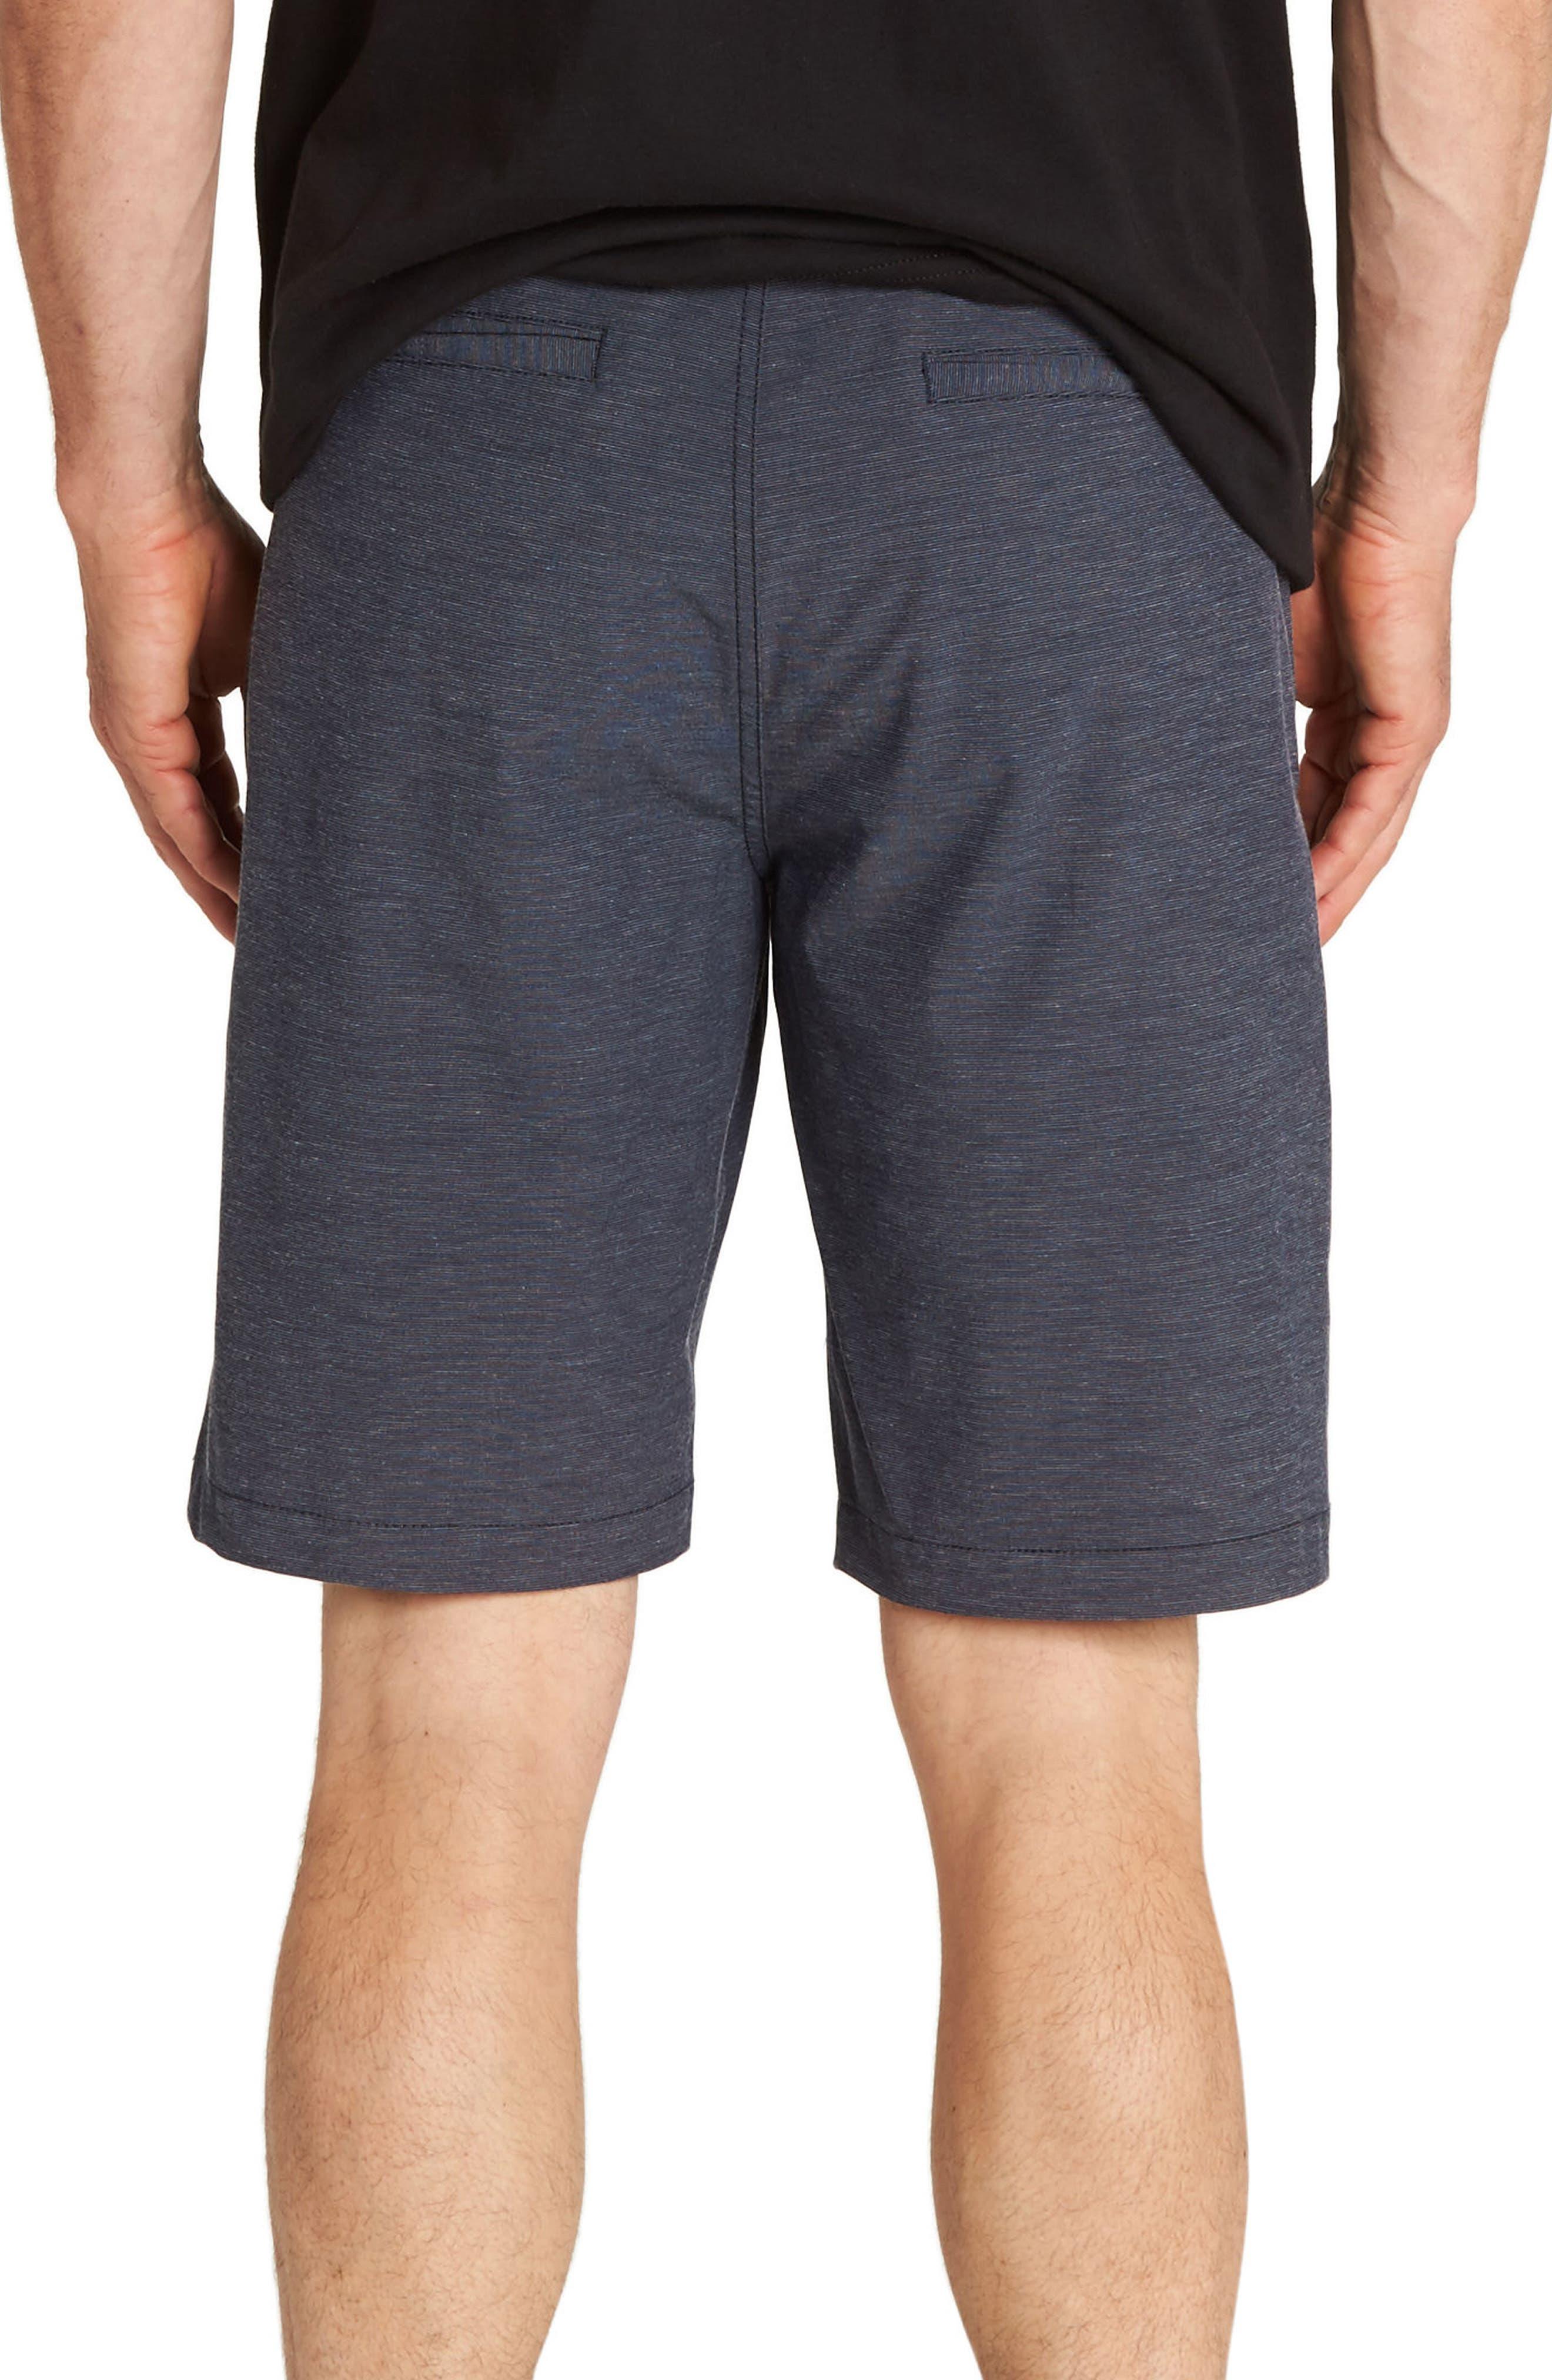 Crossfire X Mid-Length Shorts,                             Alternate thumbnail 2, color,                             Navy